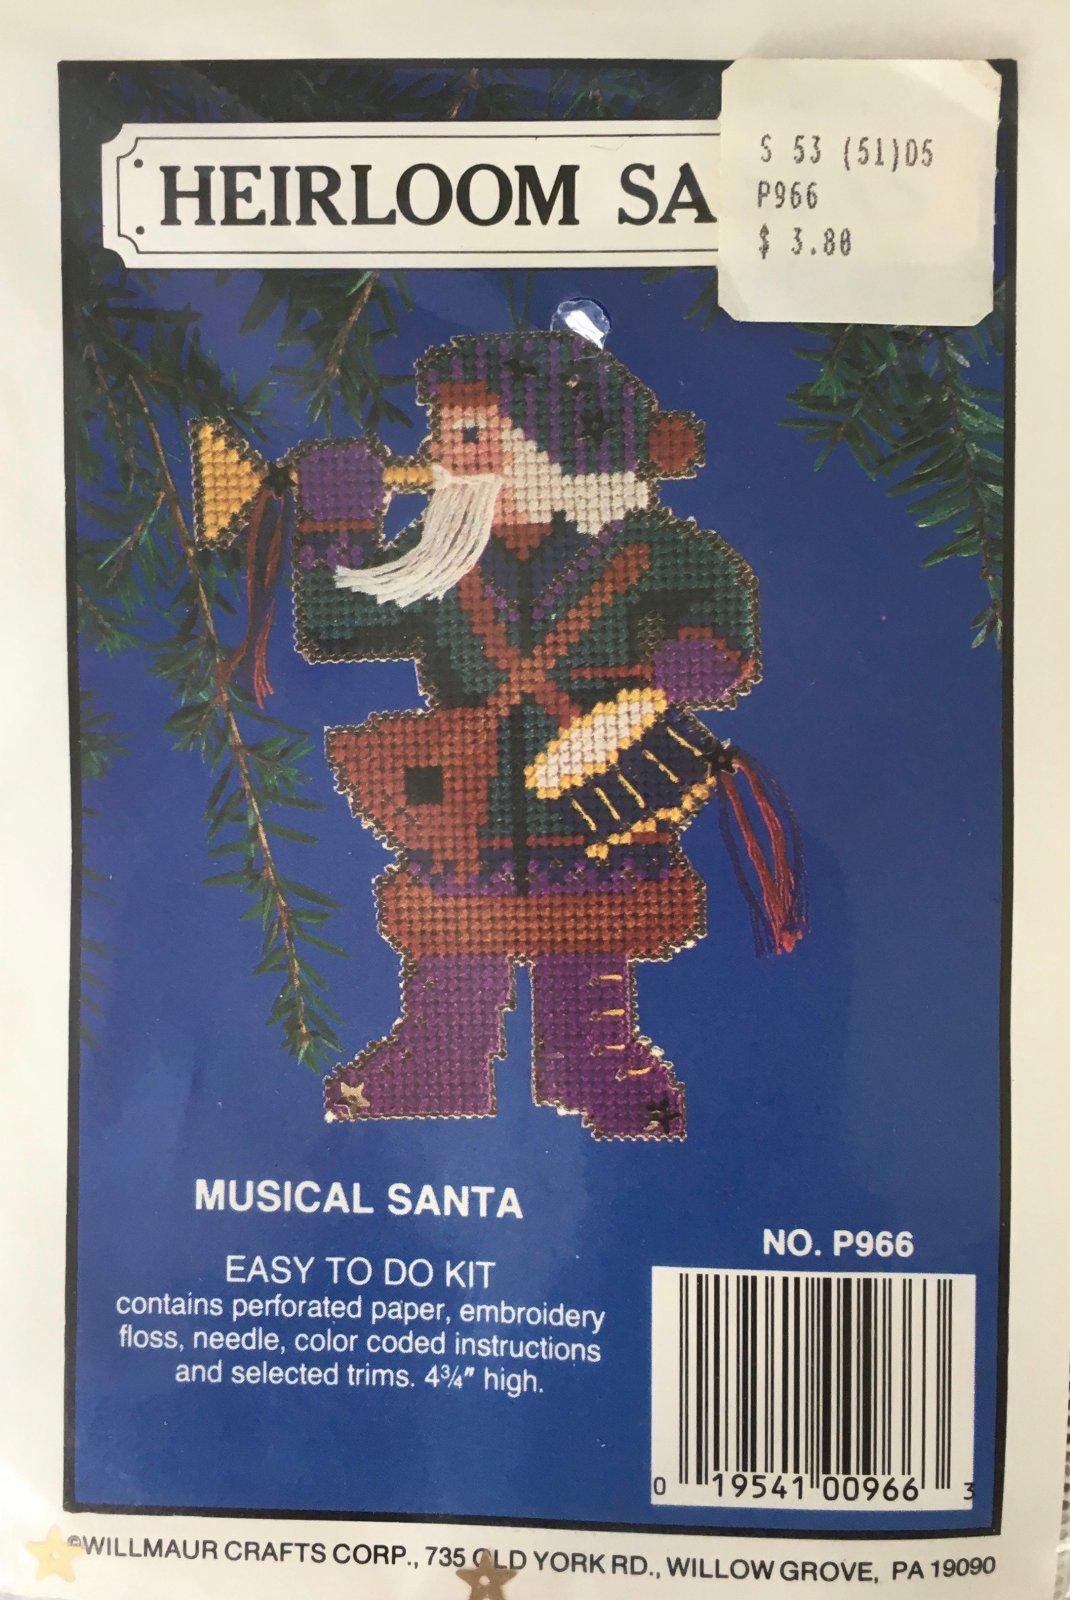 Astor Place: Heirloom Santas Musical Santa Kit P966